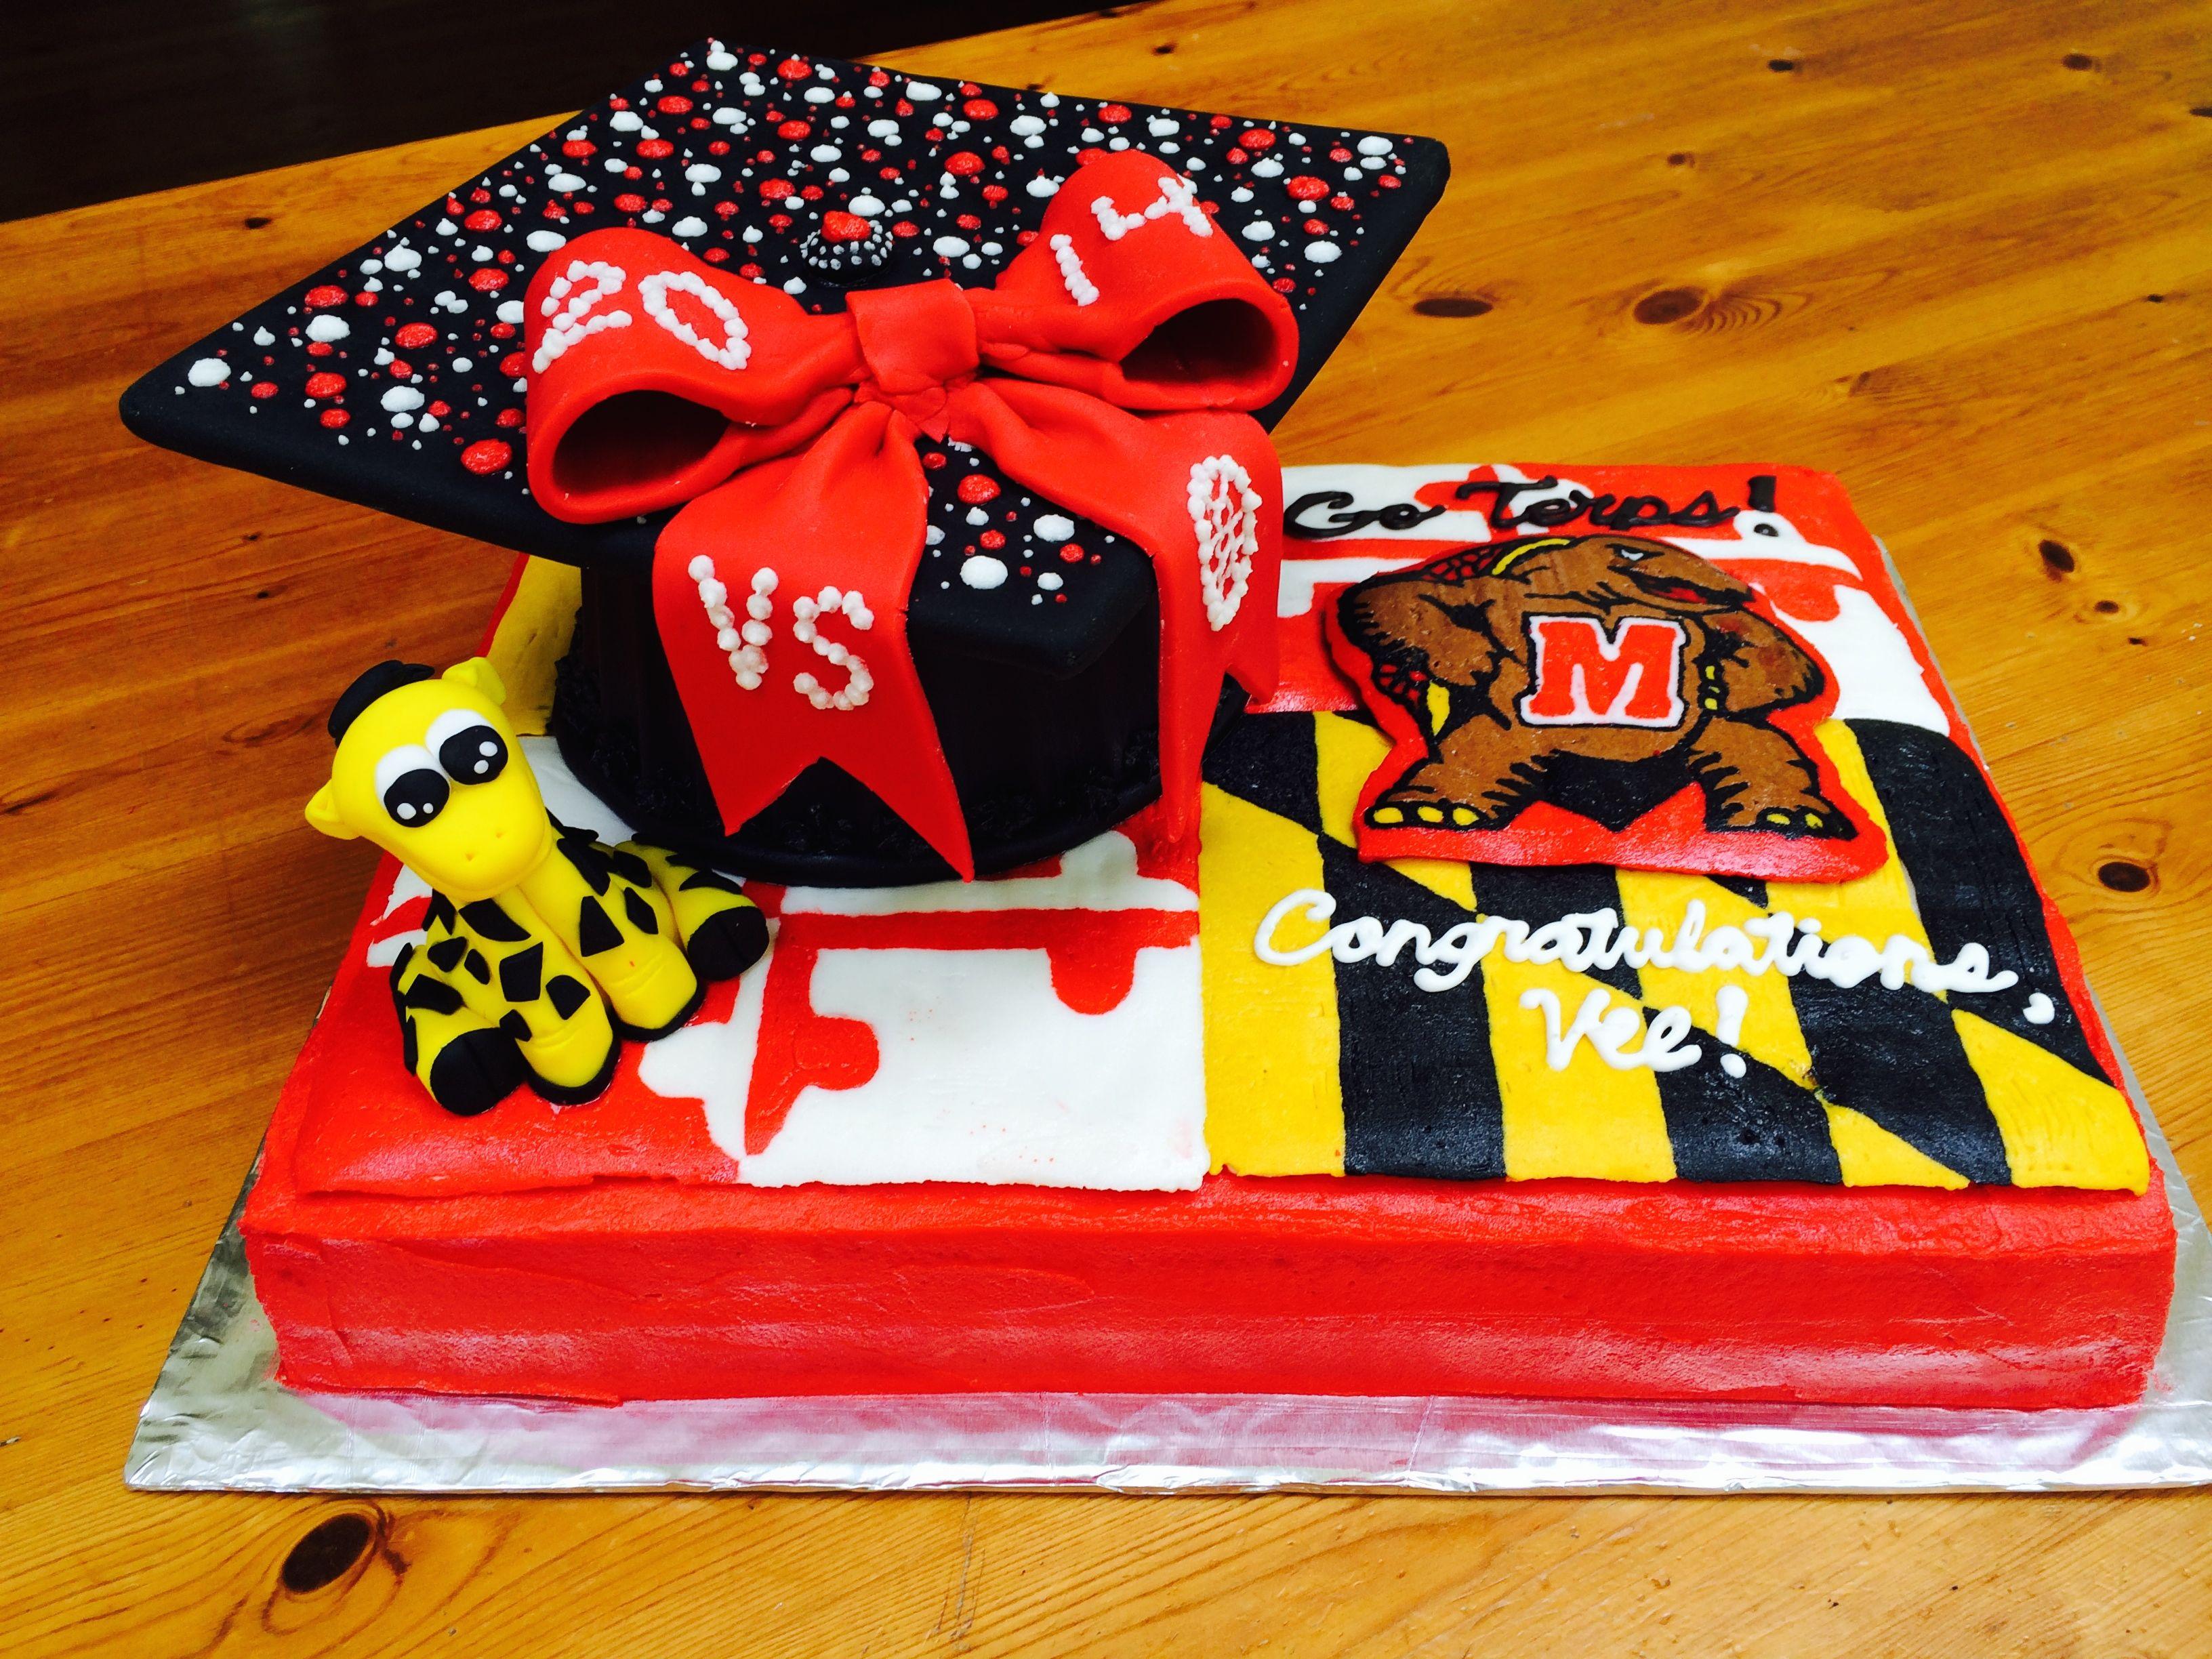 8 Photos of MD Graduation Cakes